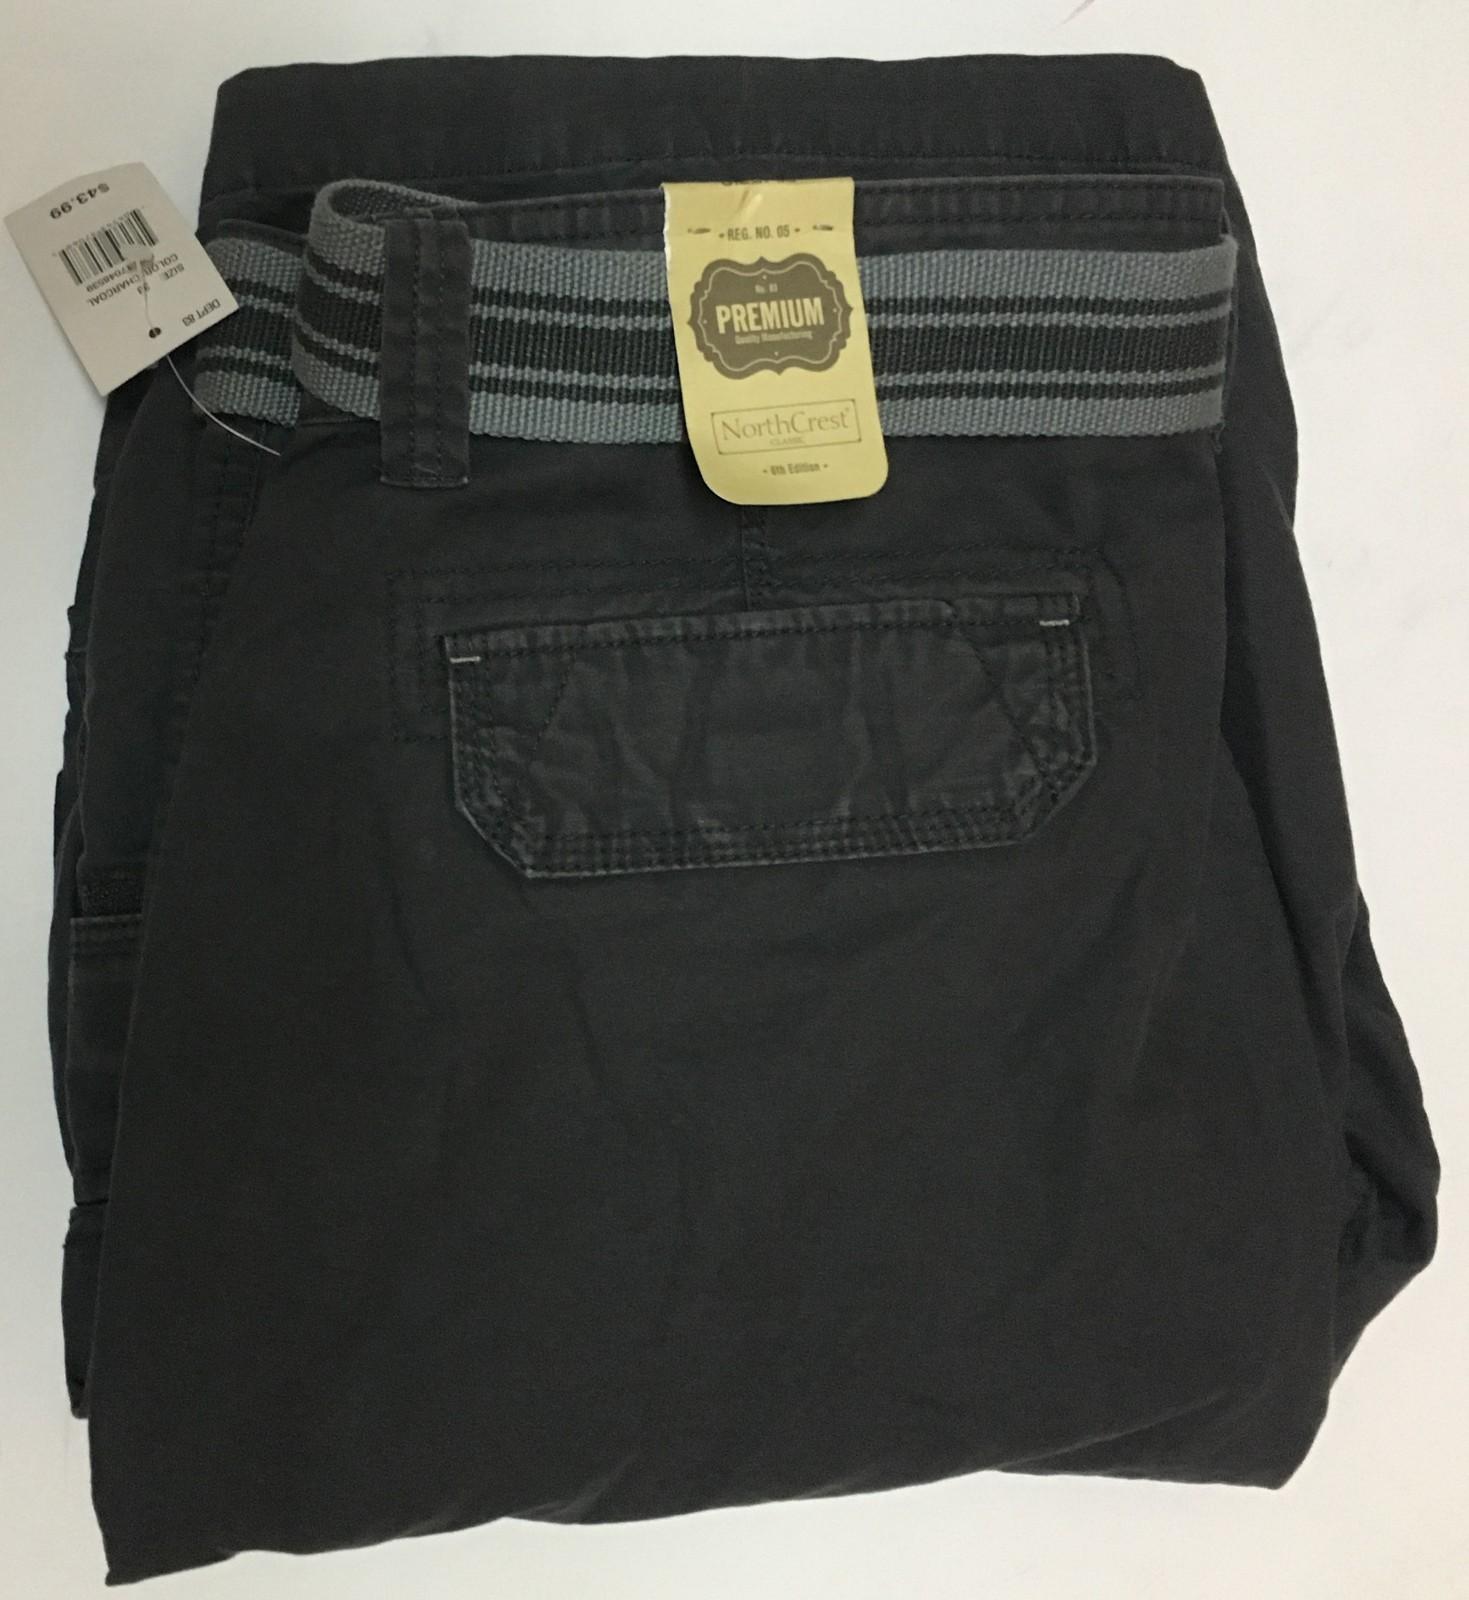 NorthCrest Premium Men's Gray Cargo Shorts W/Belt Sz 38